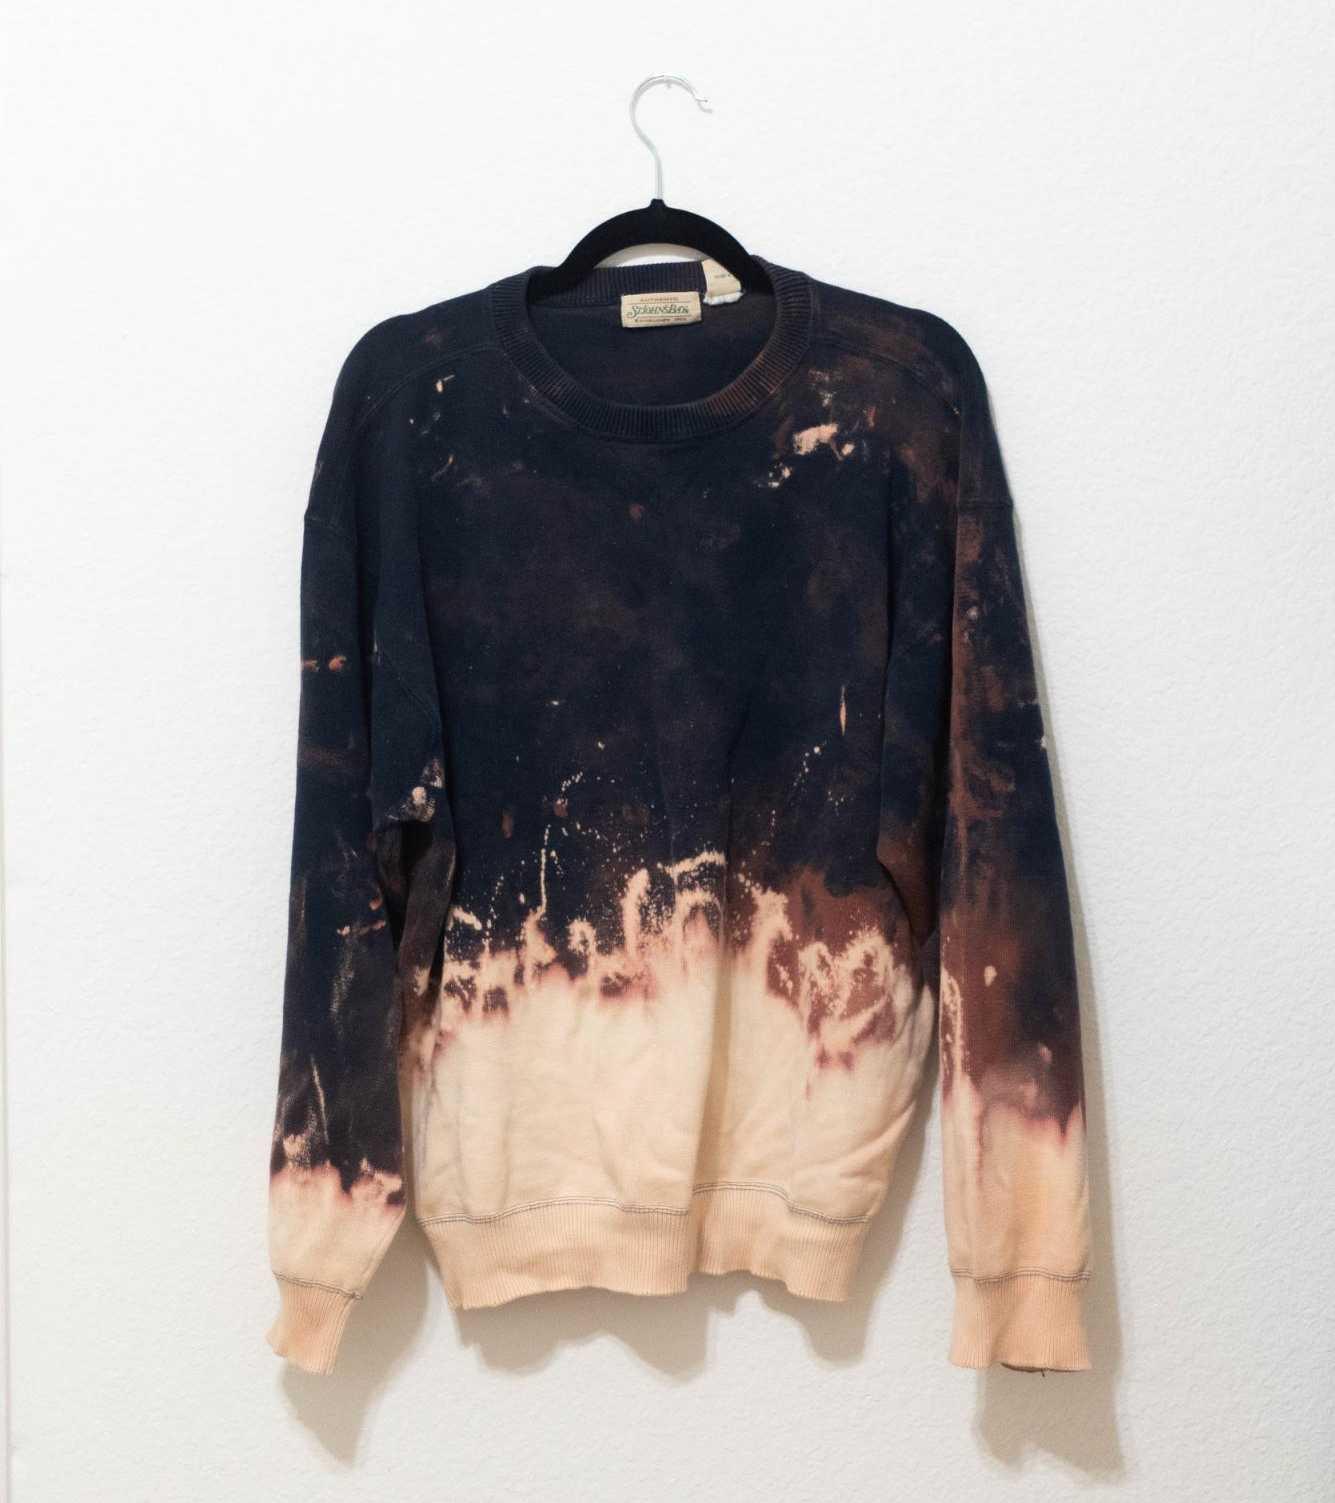 Dyed shirt 3